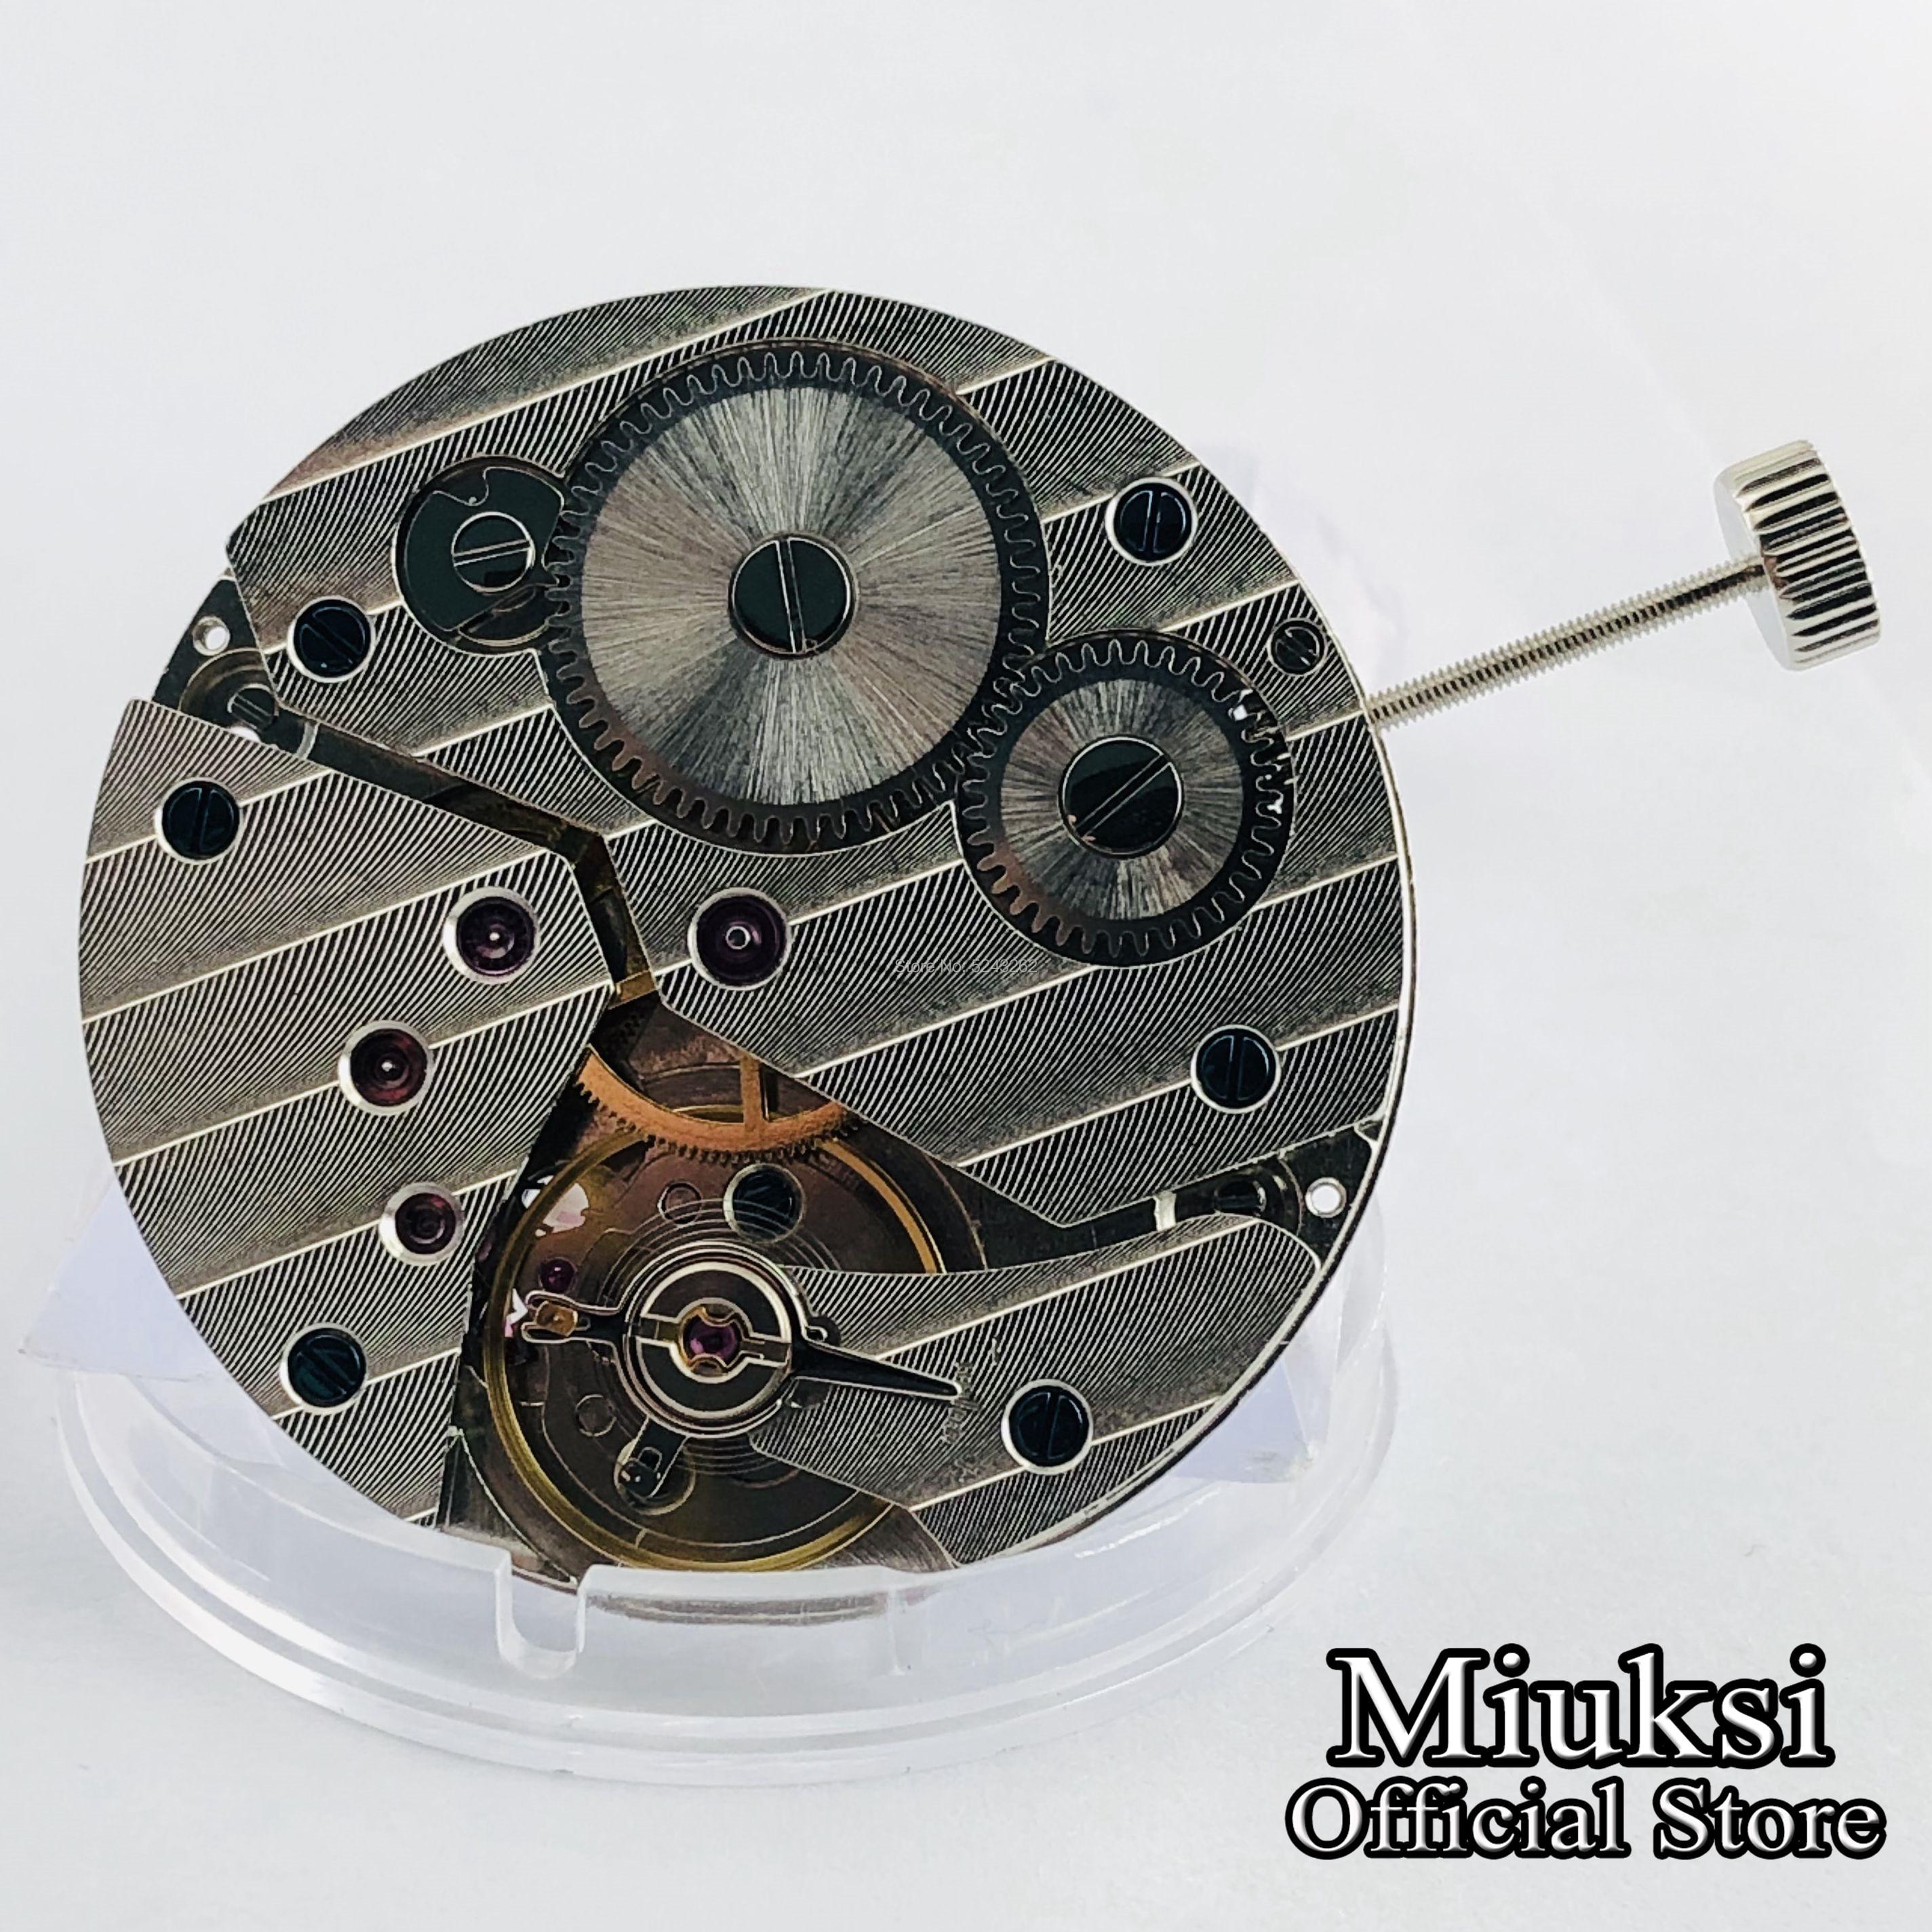 17 jewels mechanical asia 6497 Hand winding Mechanical Movement for mens watch wrist watch